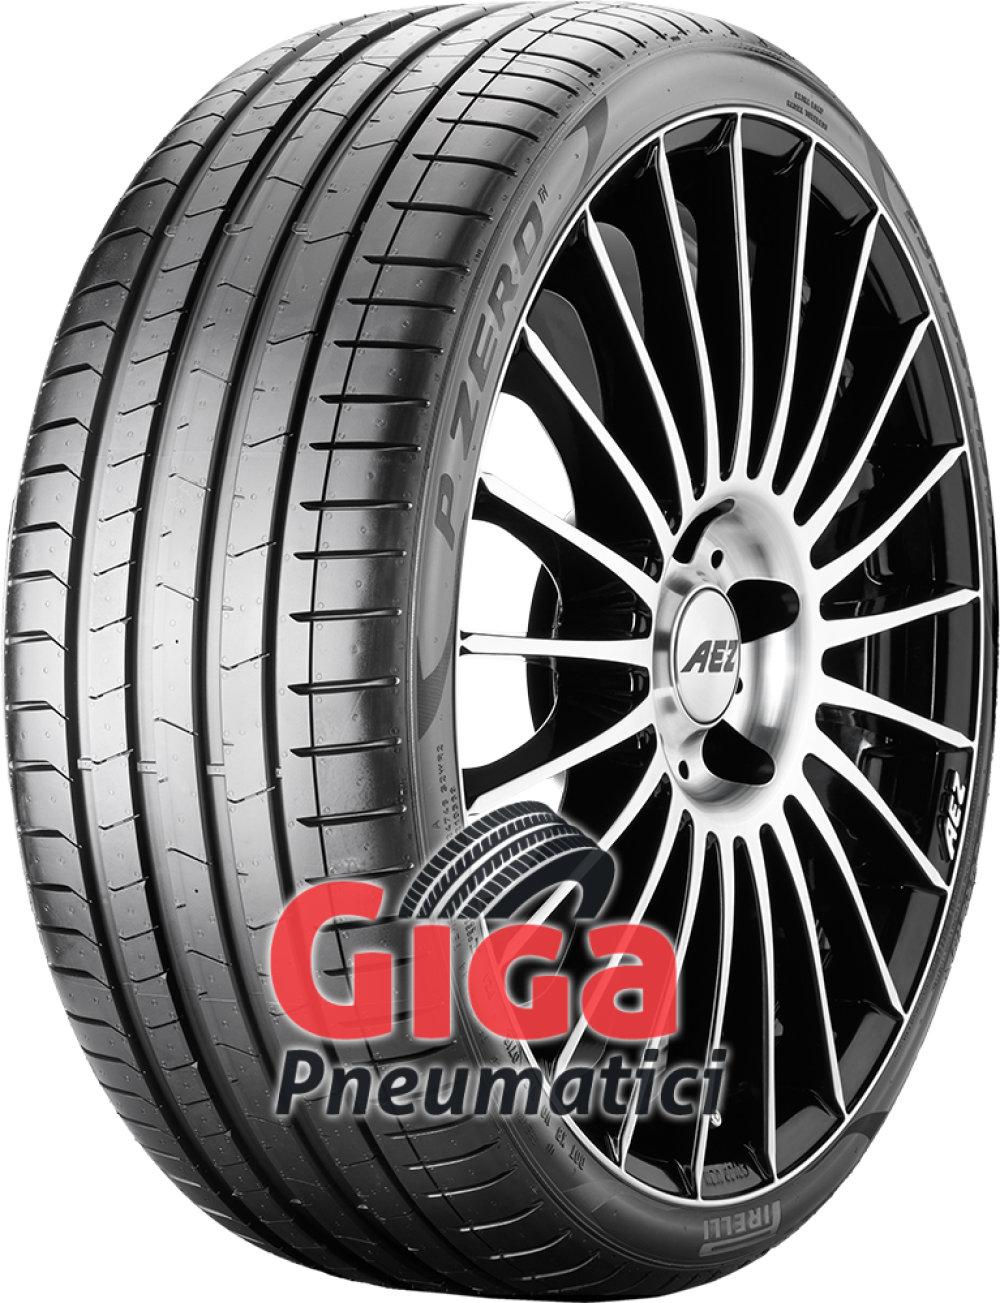 Pirelli P Zero LS ( 255/35 R20 97W XL PNCS, VOL )